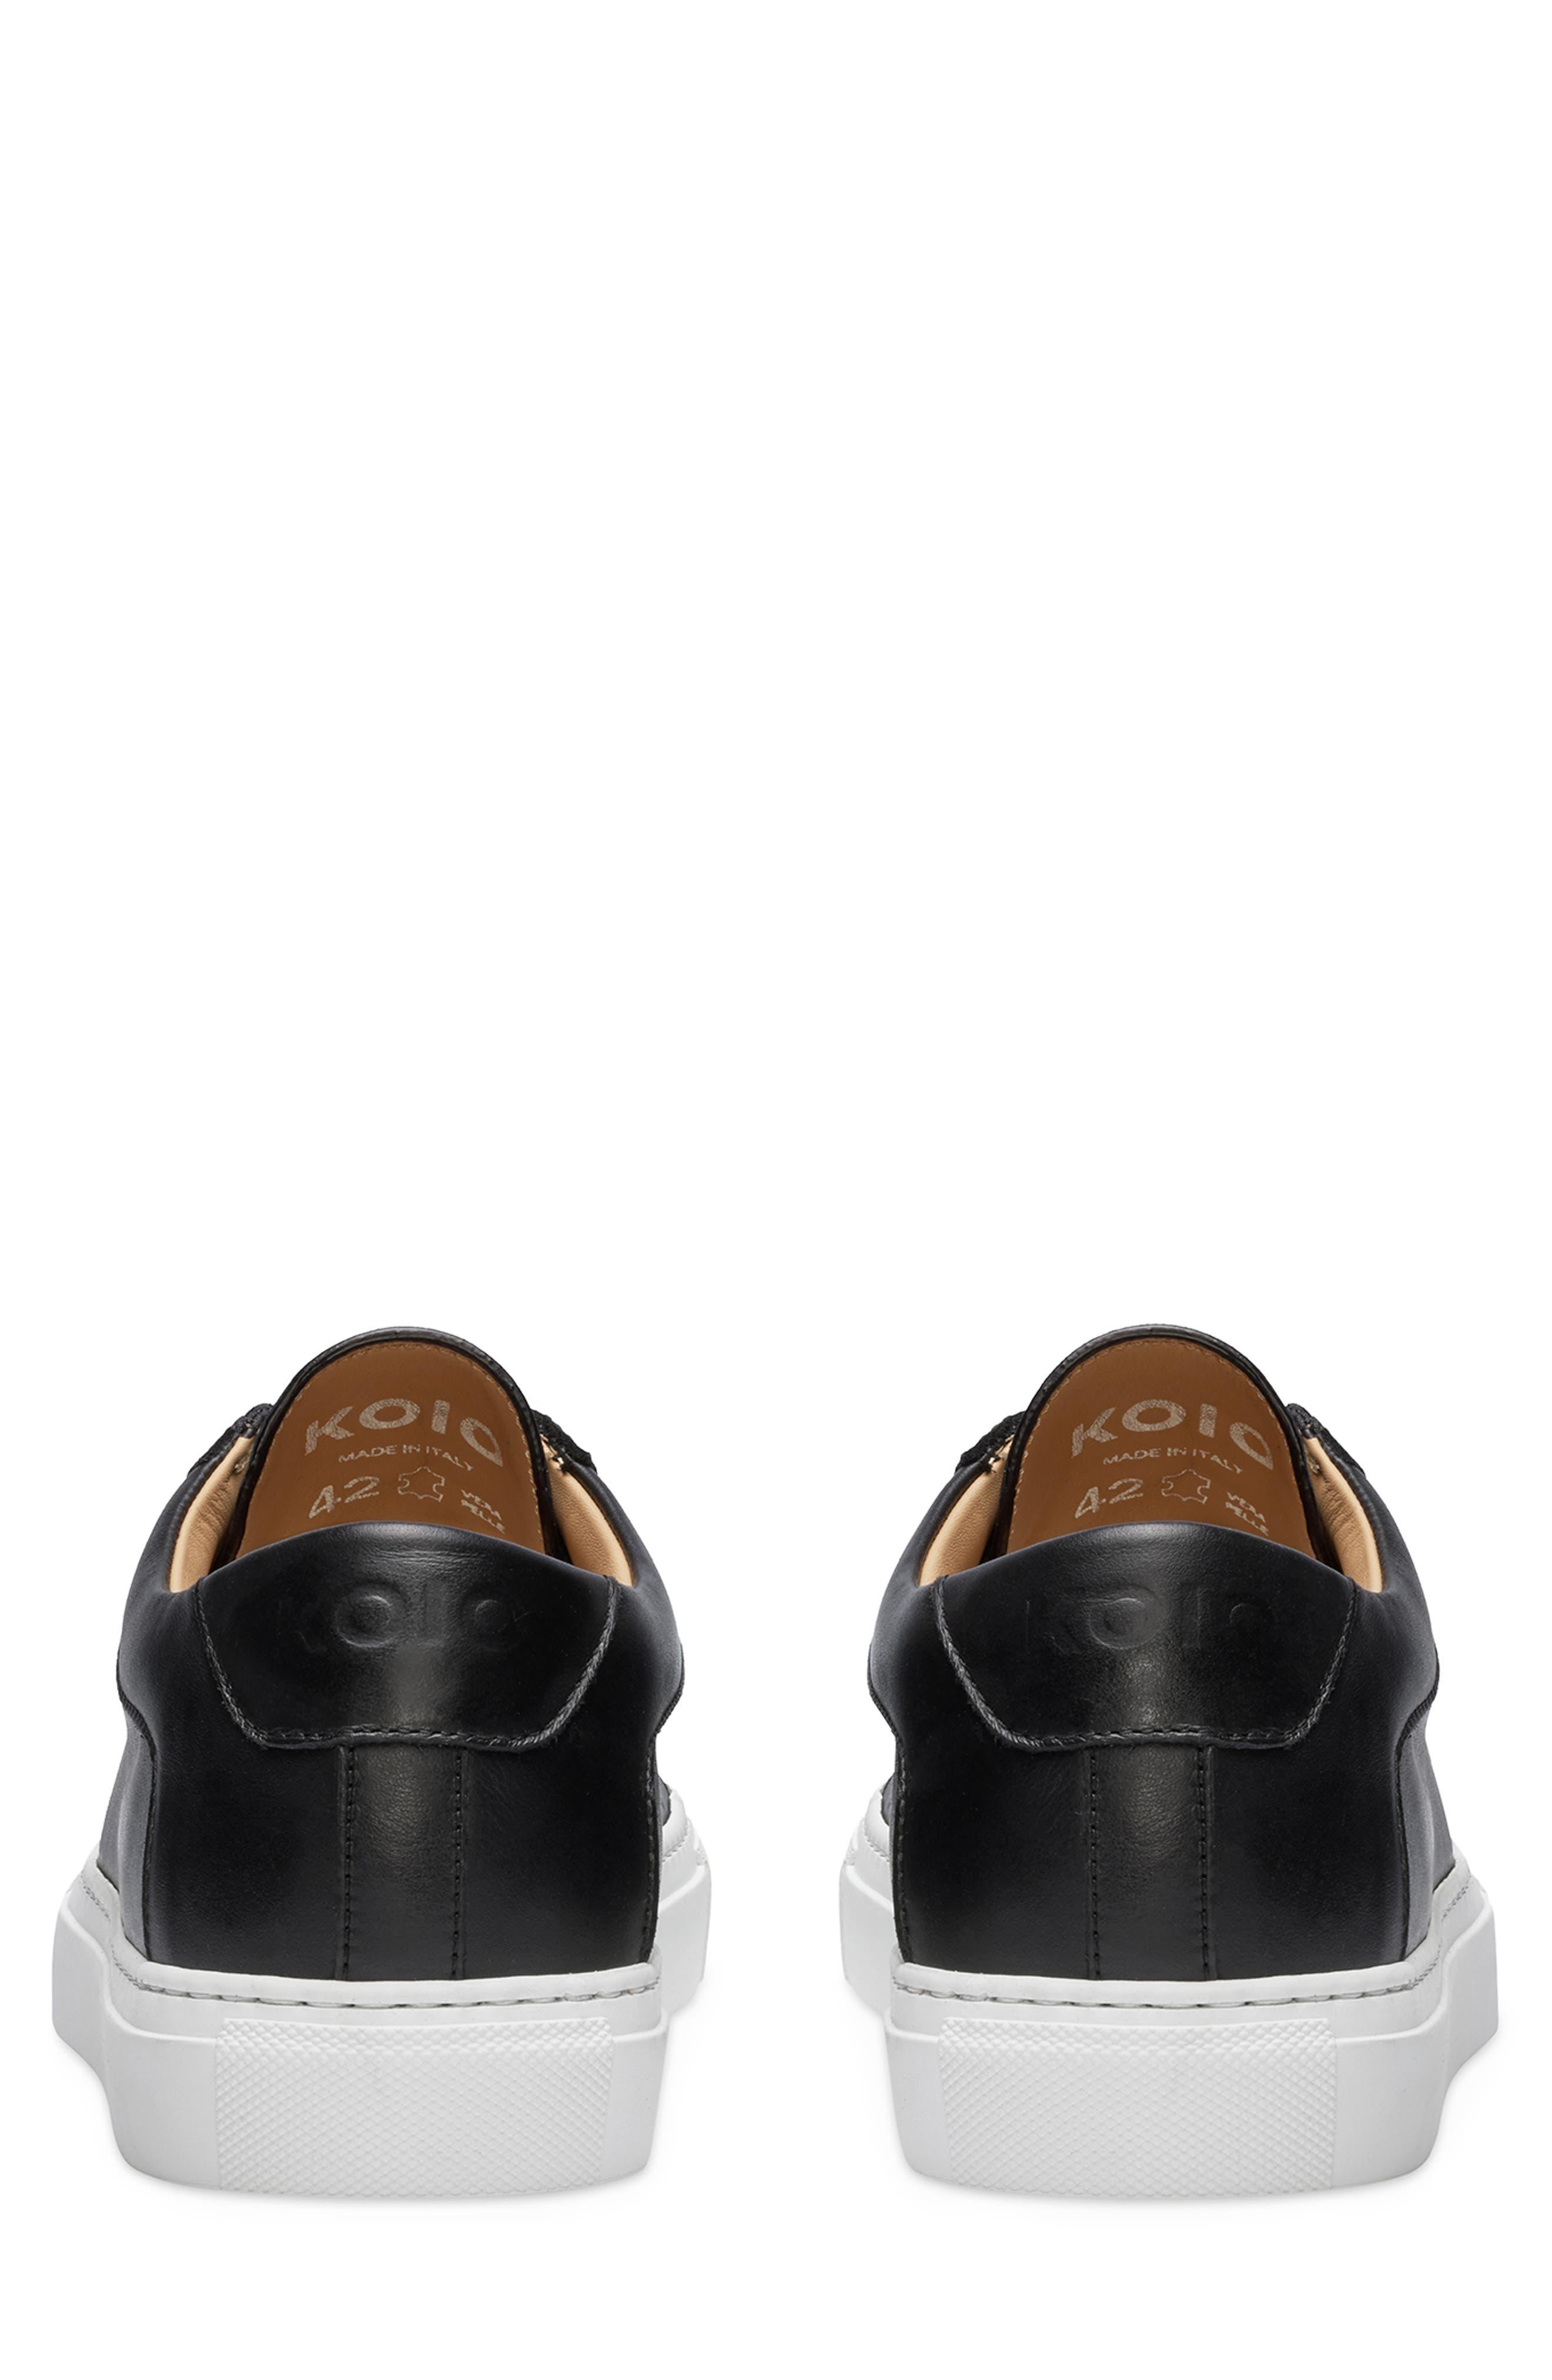 KOIO, Capri Sneaker, Alternate thumbnail 4, color, ONYX